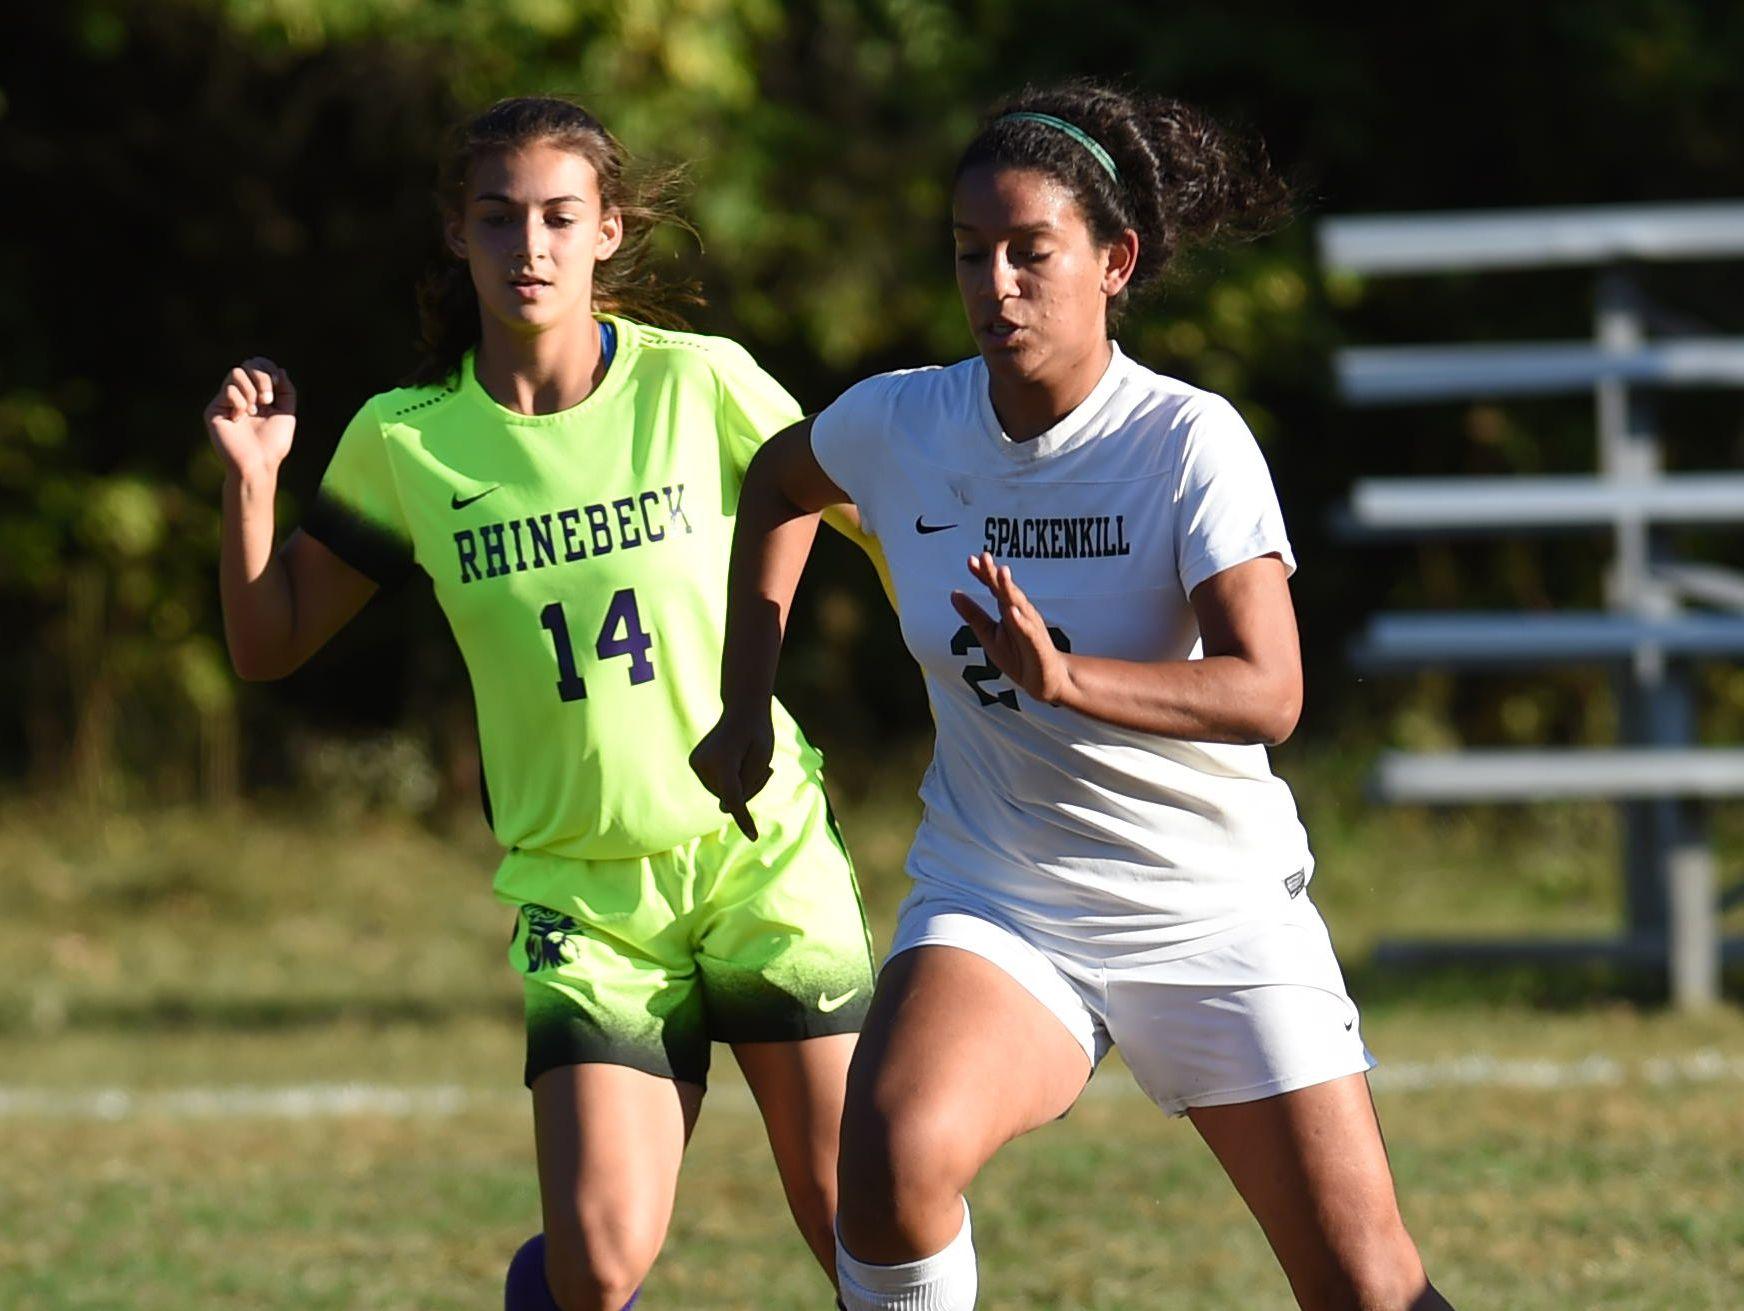 Spackenkill's Alyssa Barahona dribbles the ball away from Rhinebeck's Stephanie Cassens during Thursday's game at Spackenkill High School.